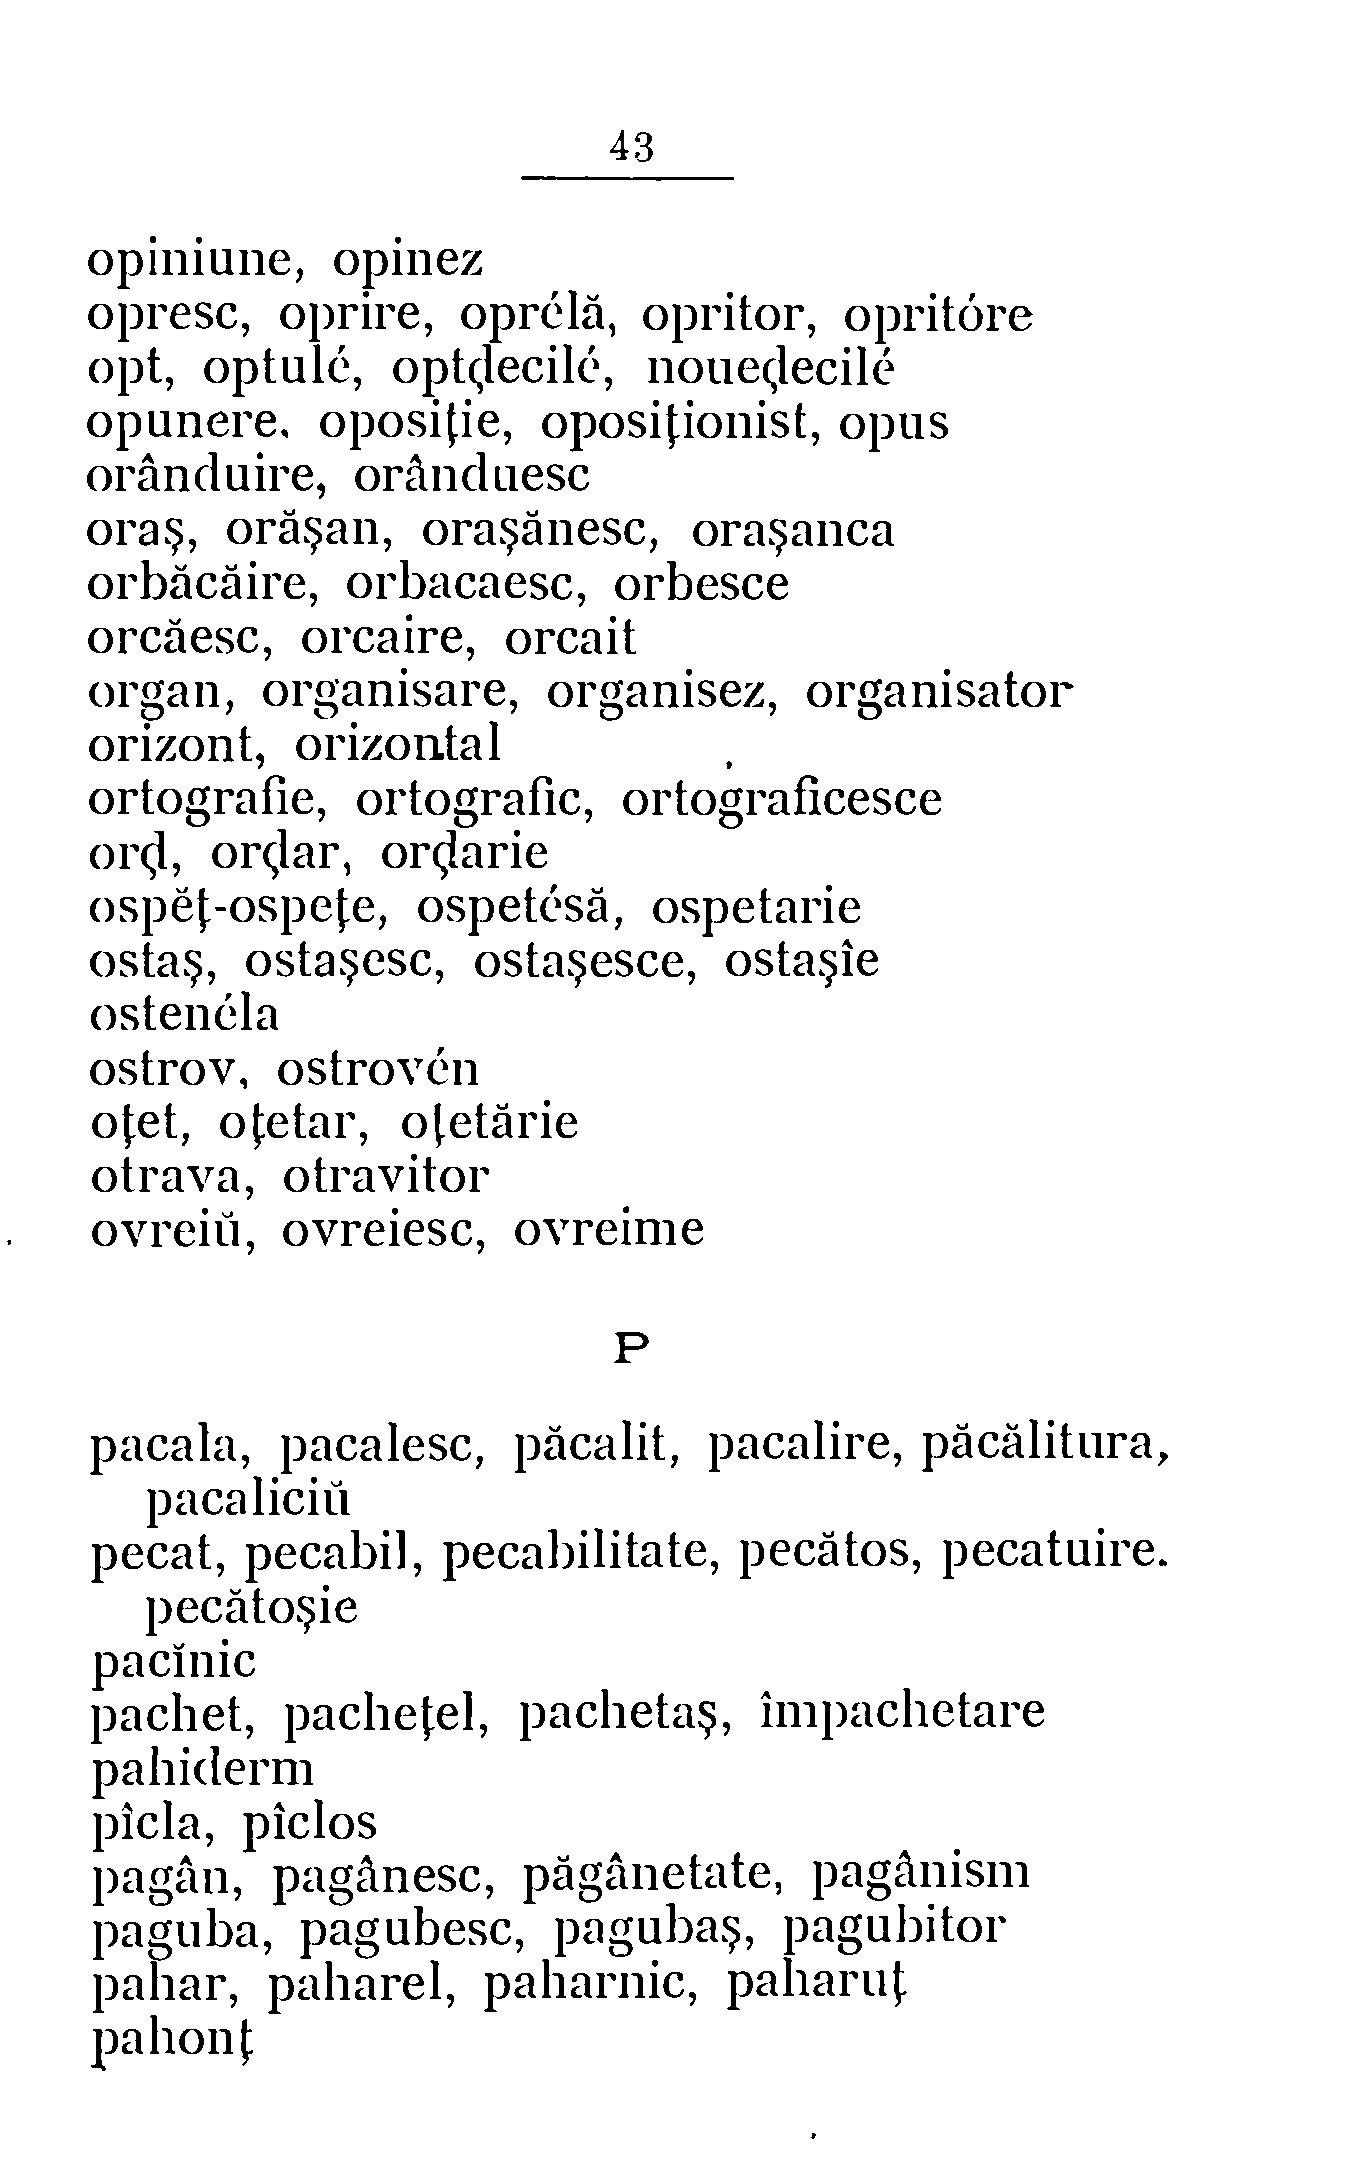 1899 - Ortografie (43).png